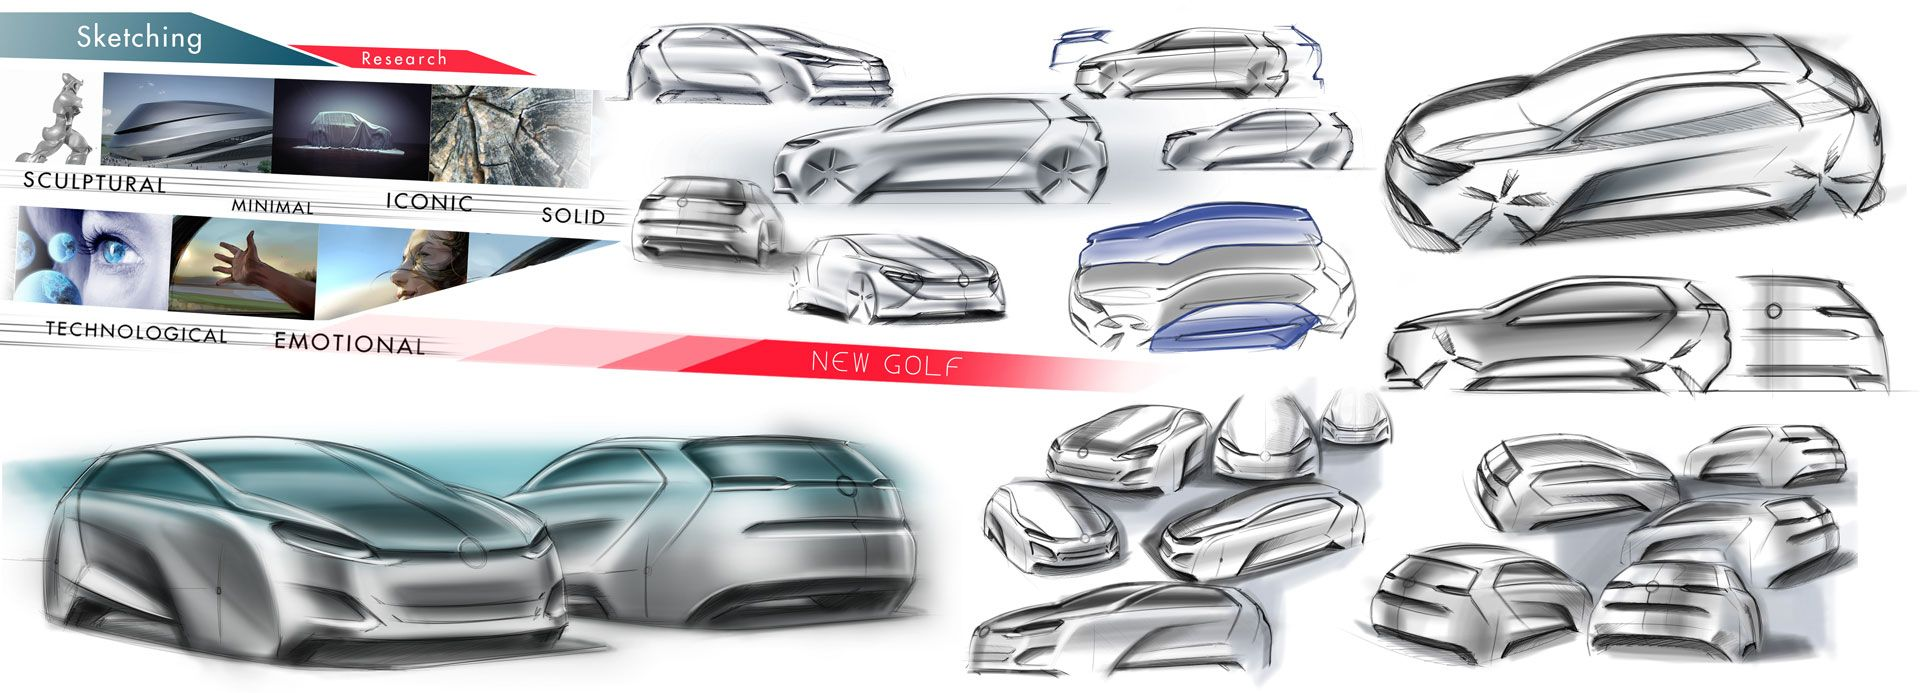 Volkswagen Golf Vision 2020 Concept Design Sketch Research